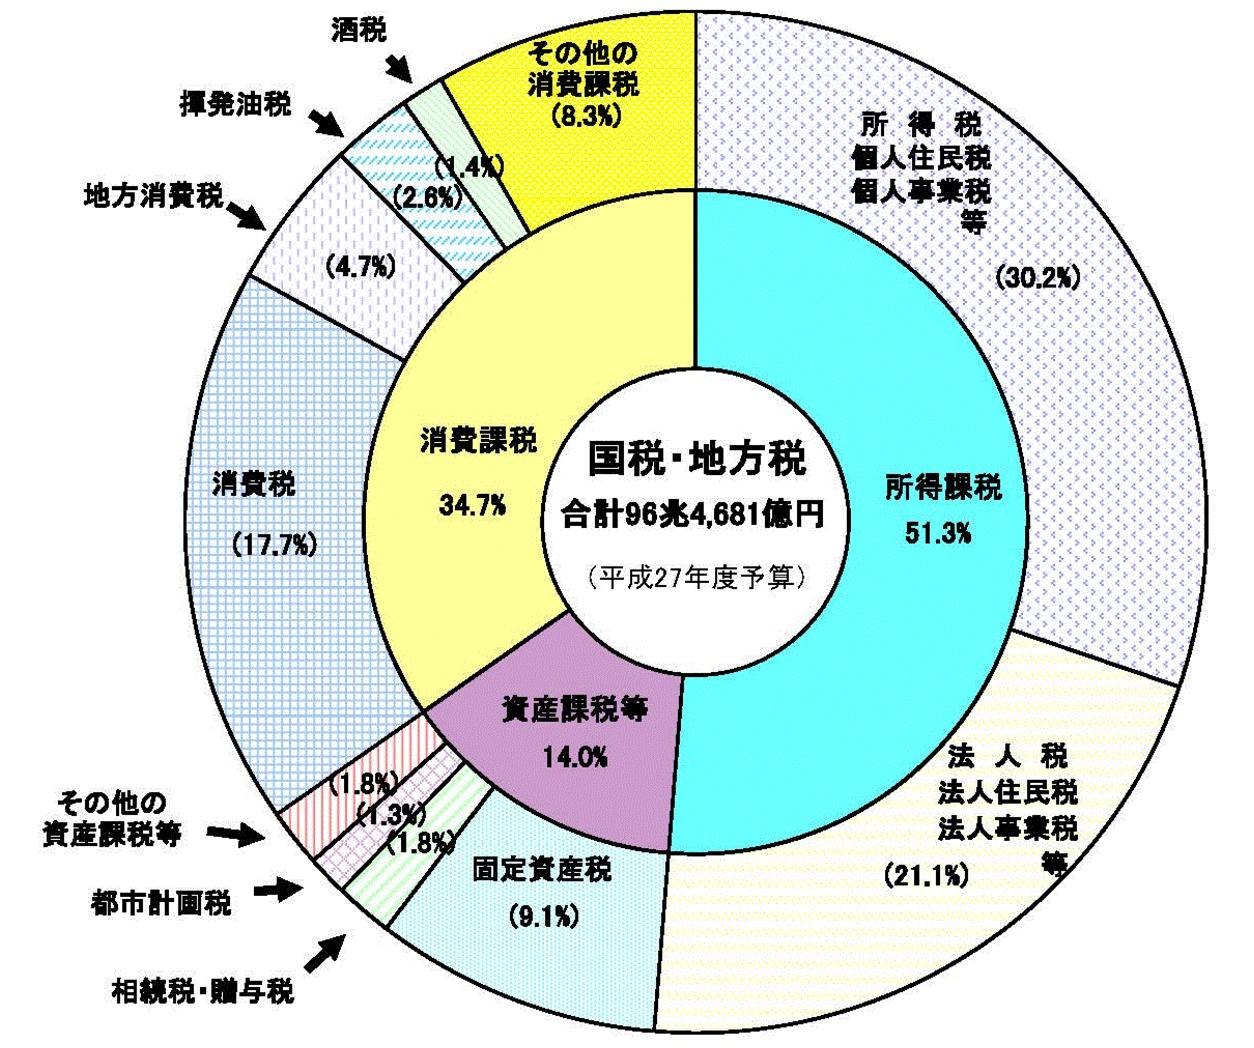 https://blog-imgs-115-origin.fc2.com/o/u/g/ougijirou/_f1f2acb0c5ffbc4170d9c0ec1ce161ef.png